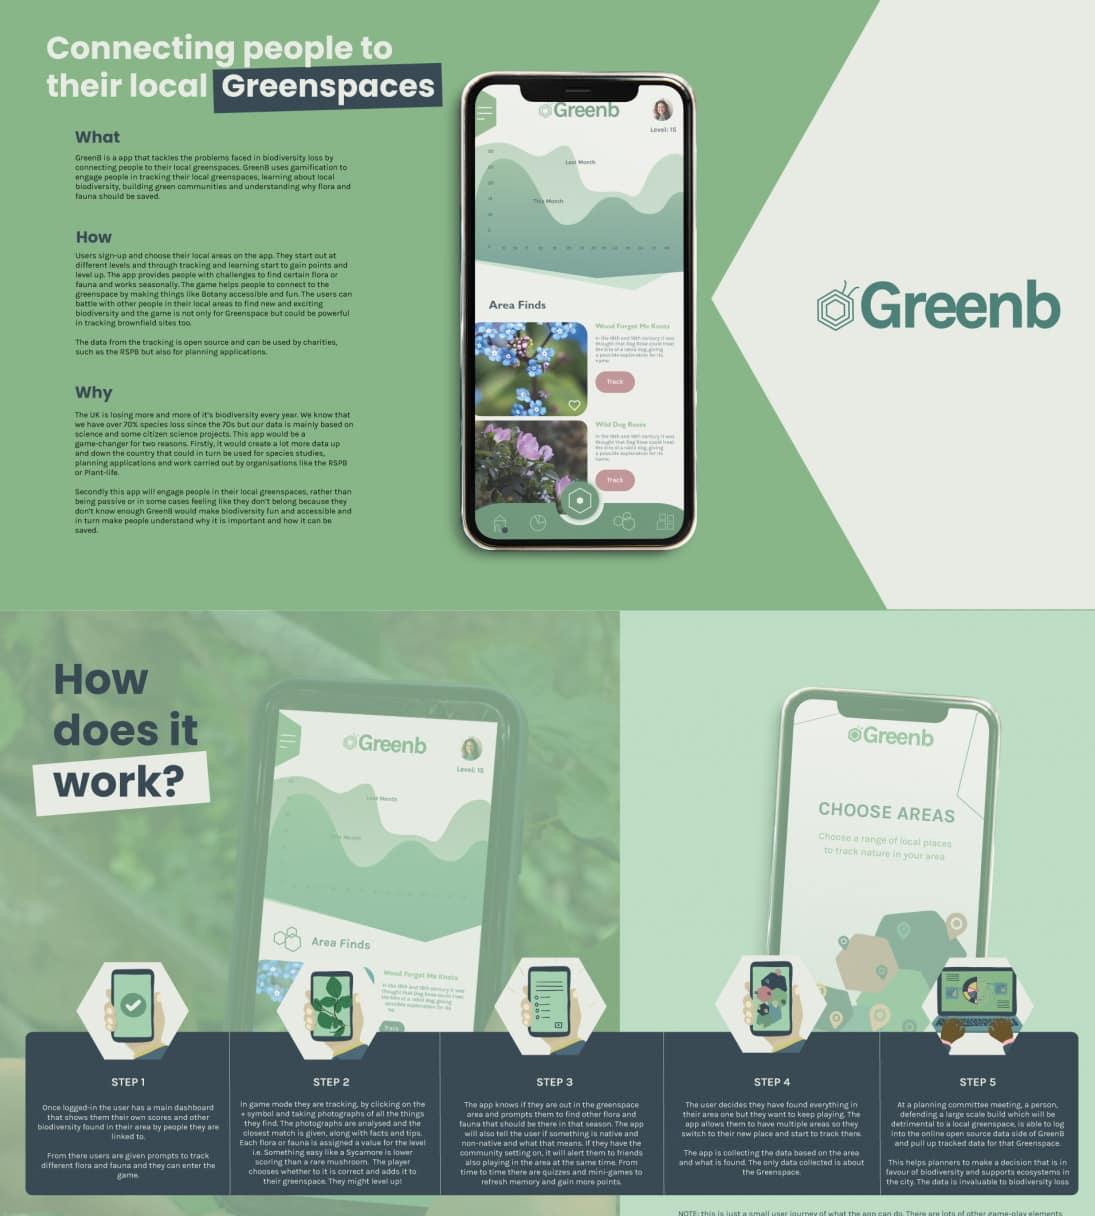 design-age-crisis-london-design-biennale-green-b-app-2